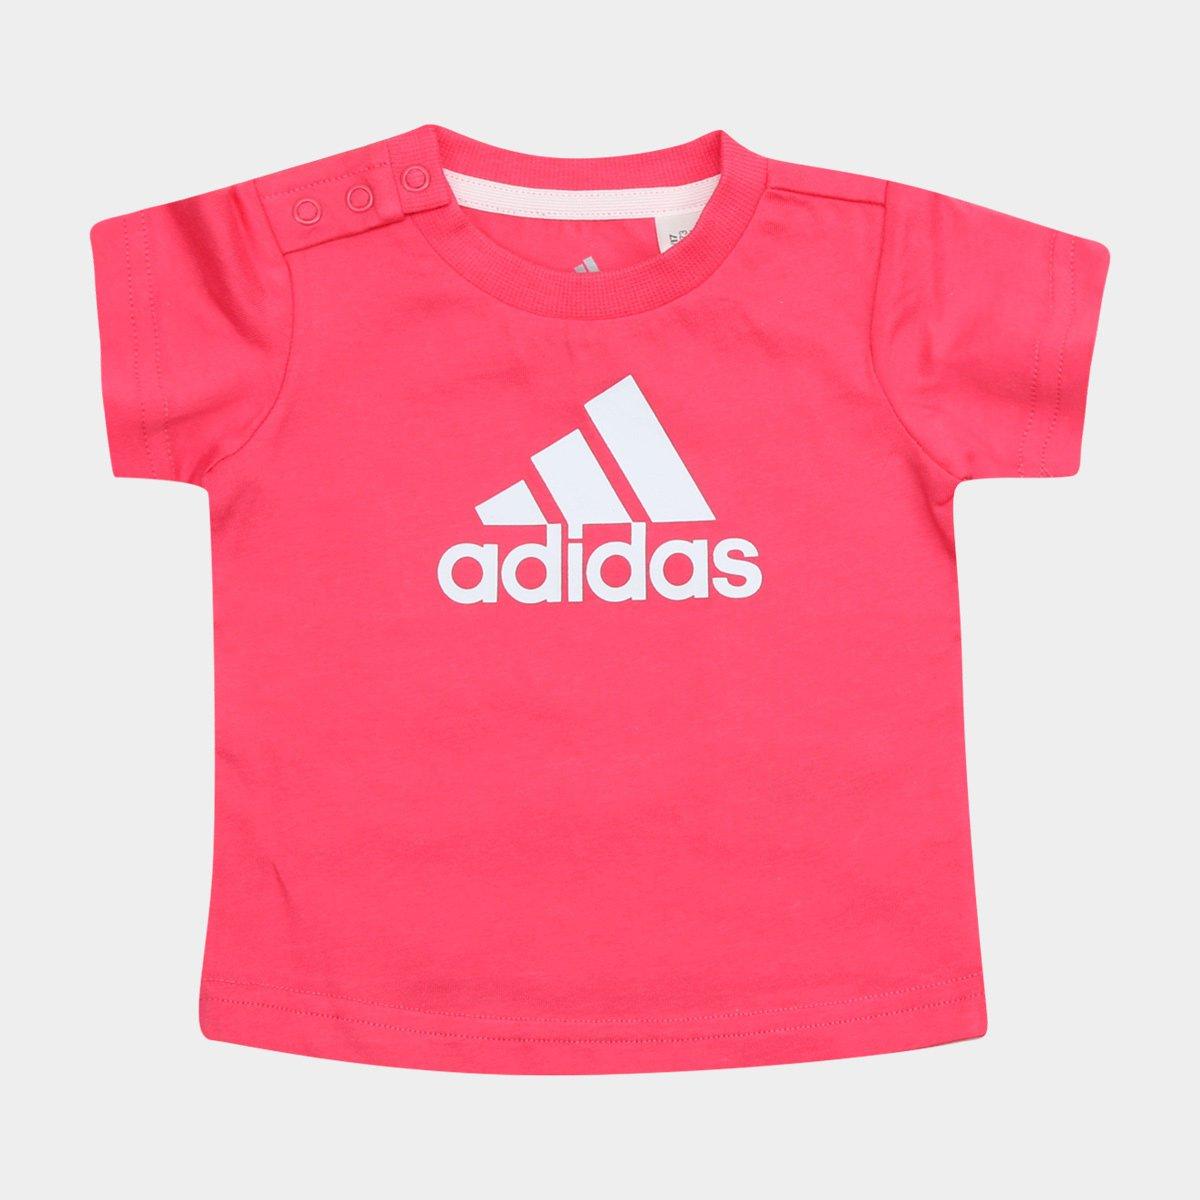 Pink I Camiseta Infantil Fav Camiseta Tee Baby Adidas Infantil Adidas wzUqOwX